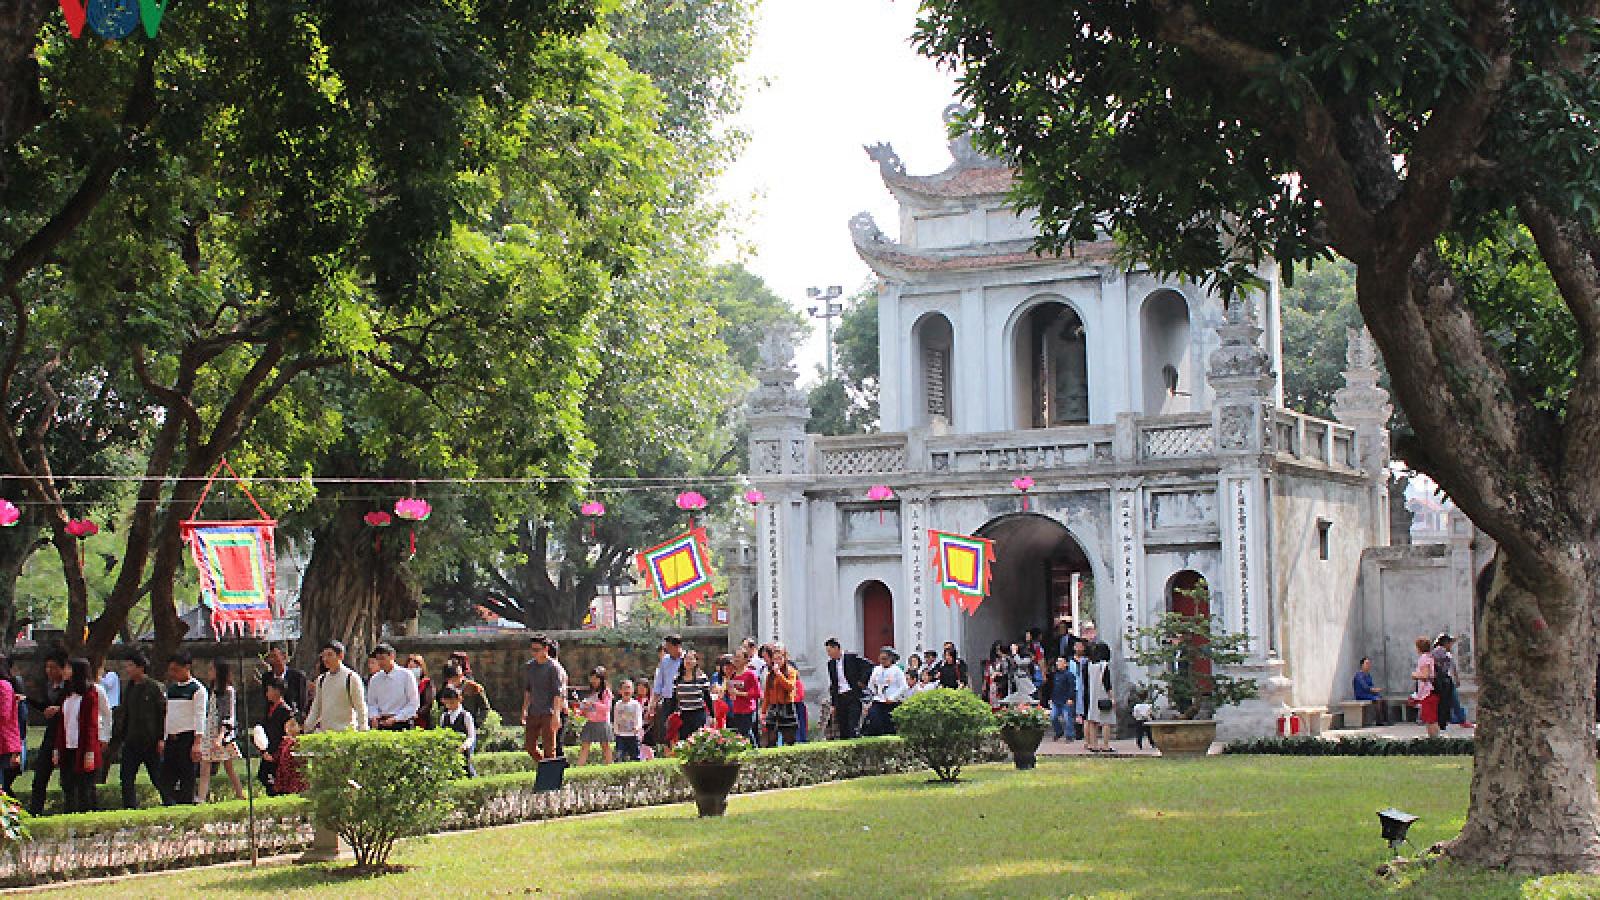 Thousands of calligraphy lovers flock to Van Mieu Temple